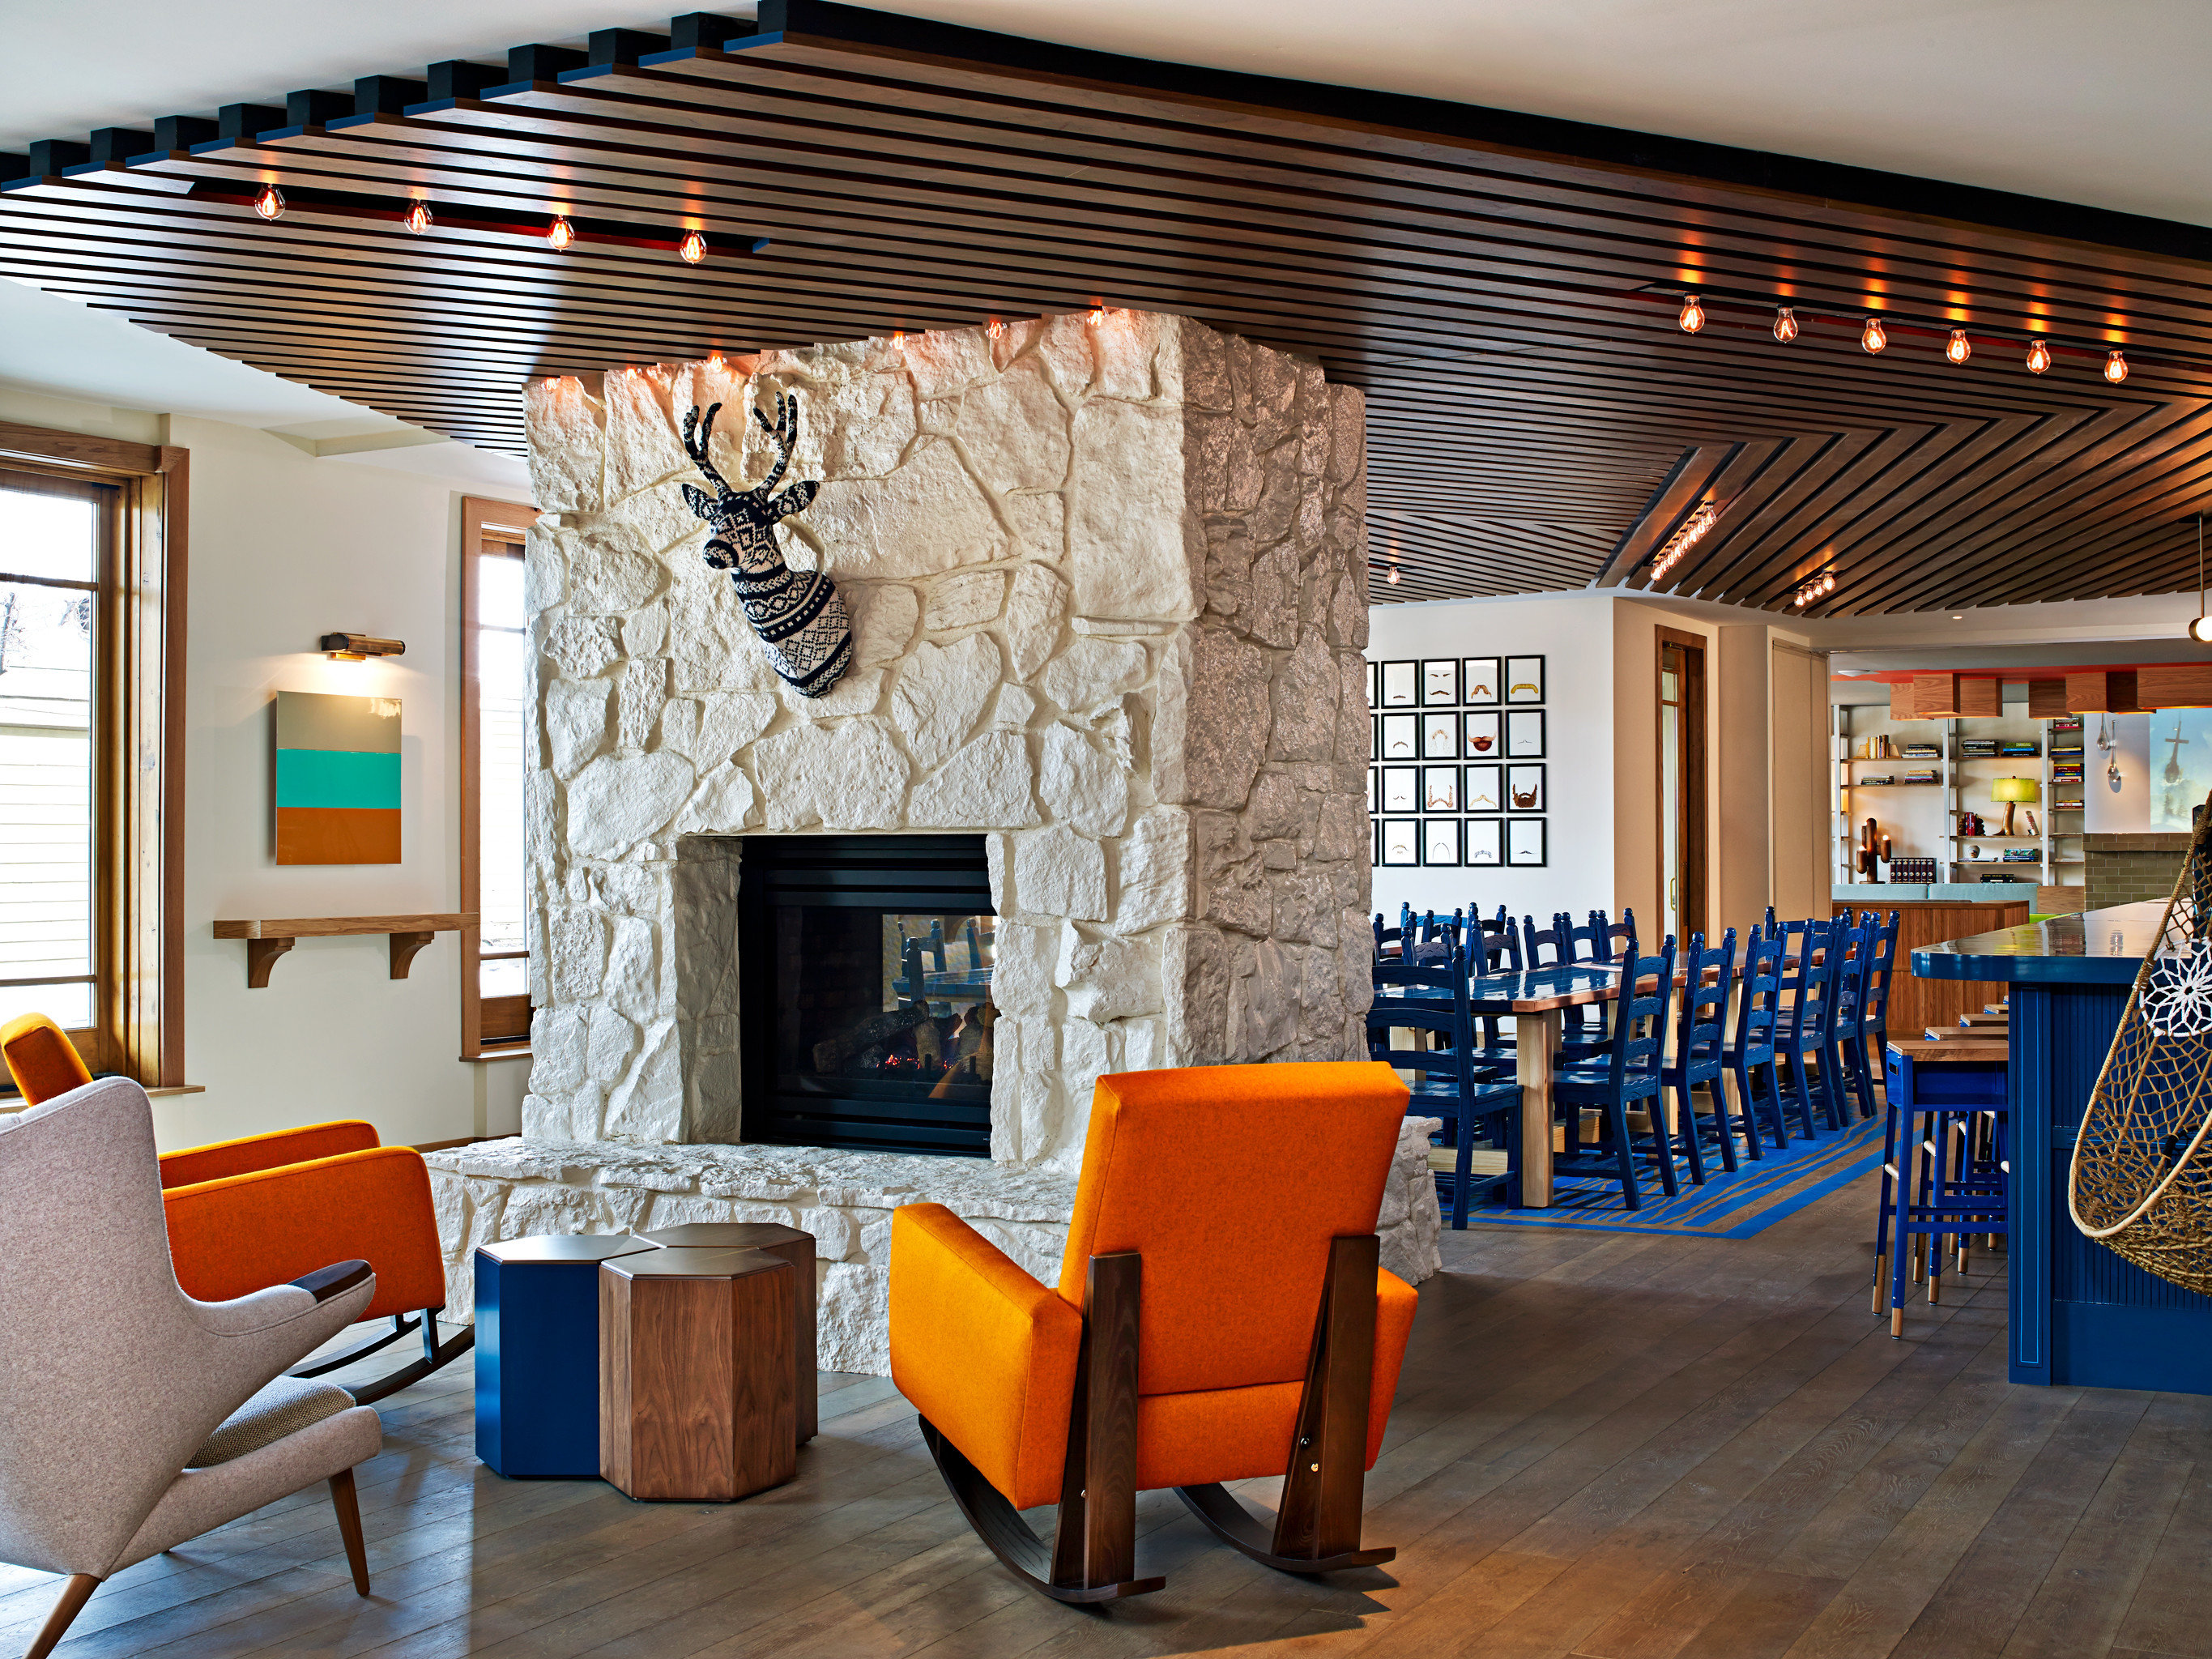 Lodge Lounge Mountains Ski chair property living room orange home cottage